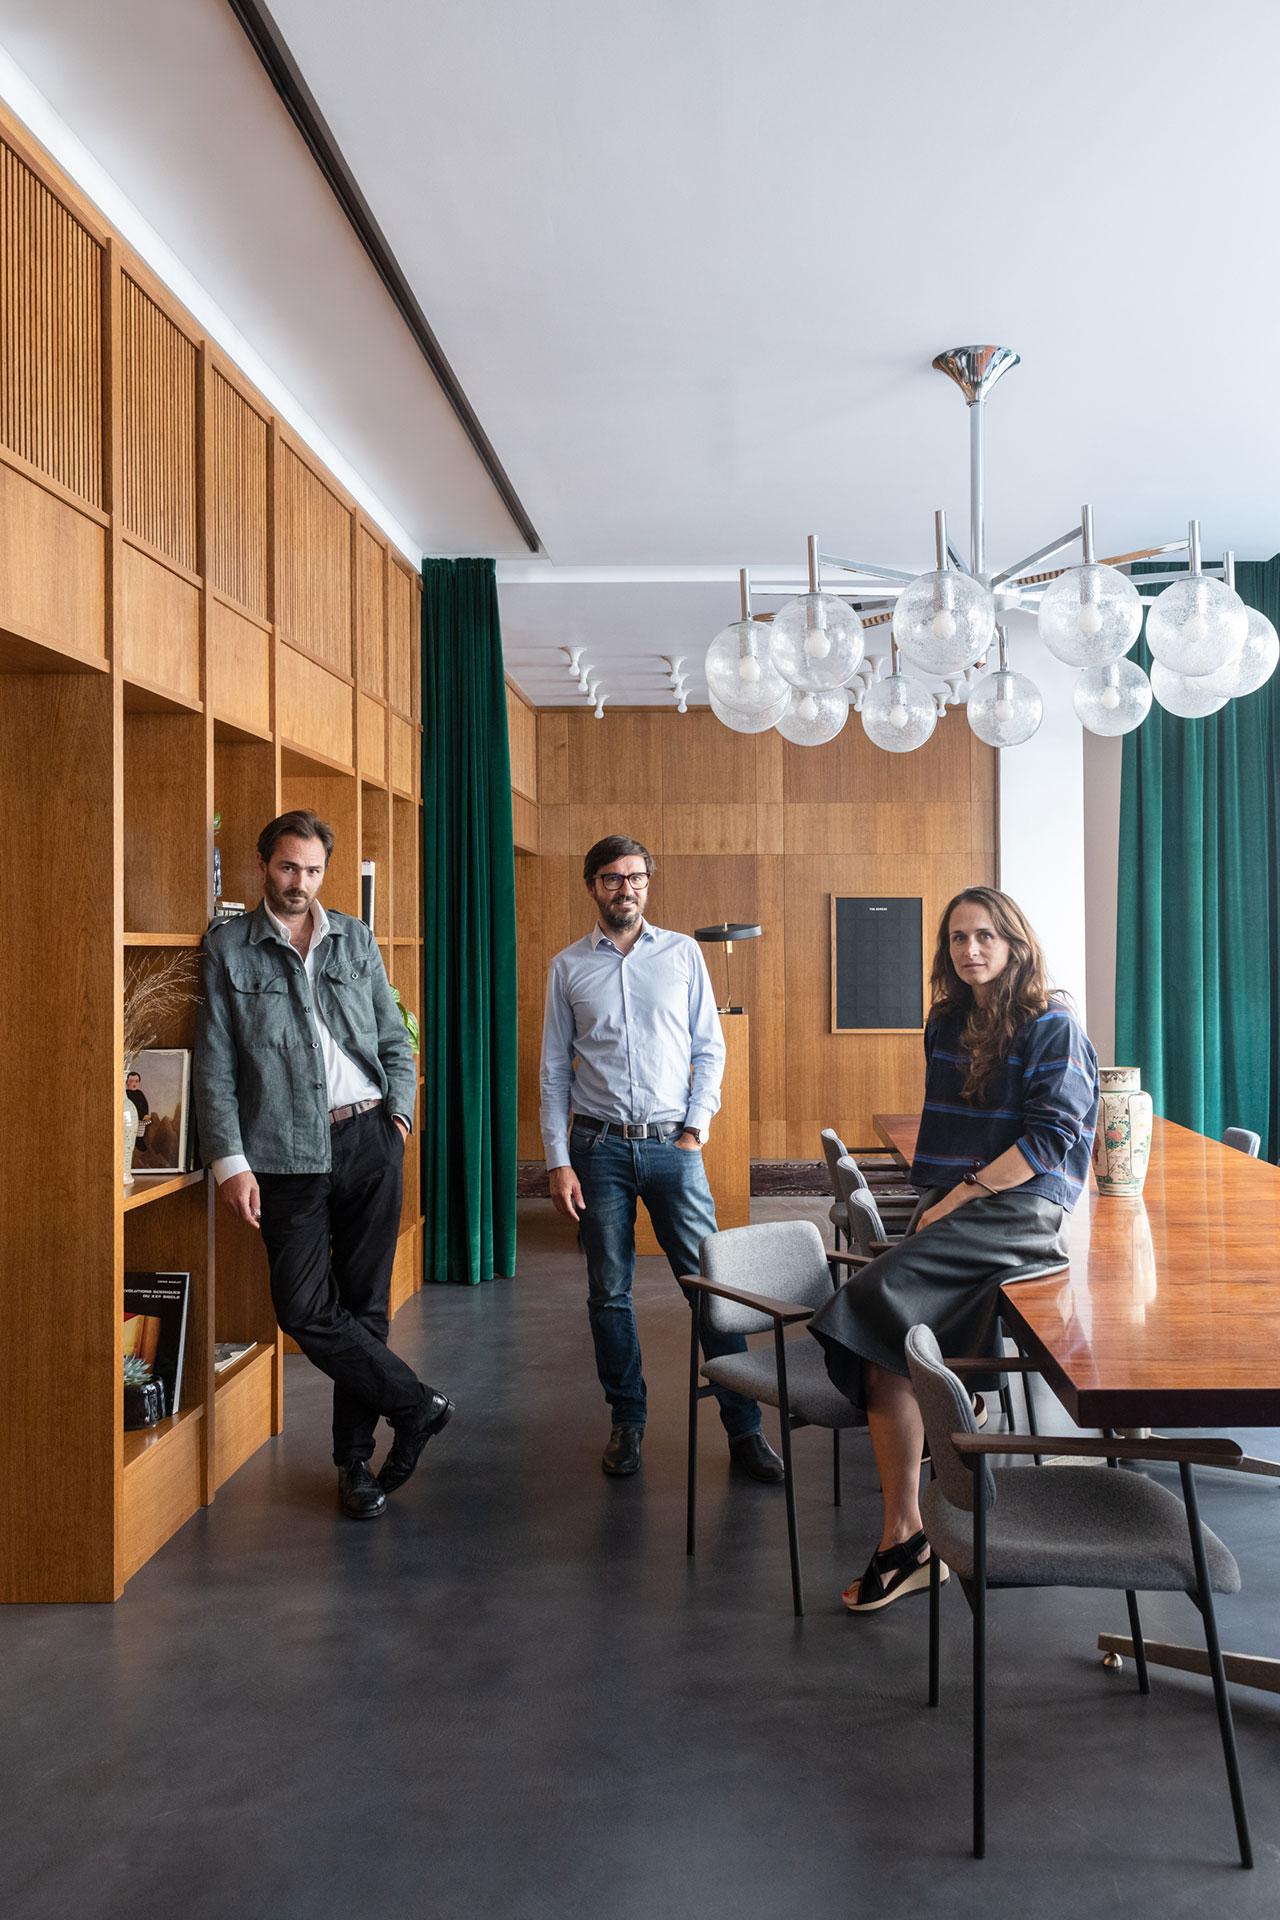 Architect Franklin Azzi, founder of The Bureau Laurent Geneslay, founder of The Socialite FamilyConstance Gennari. Photography © Valerio Geraci